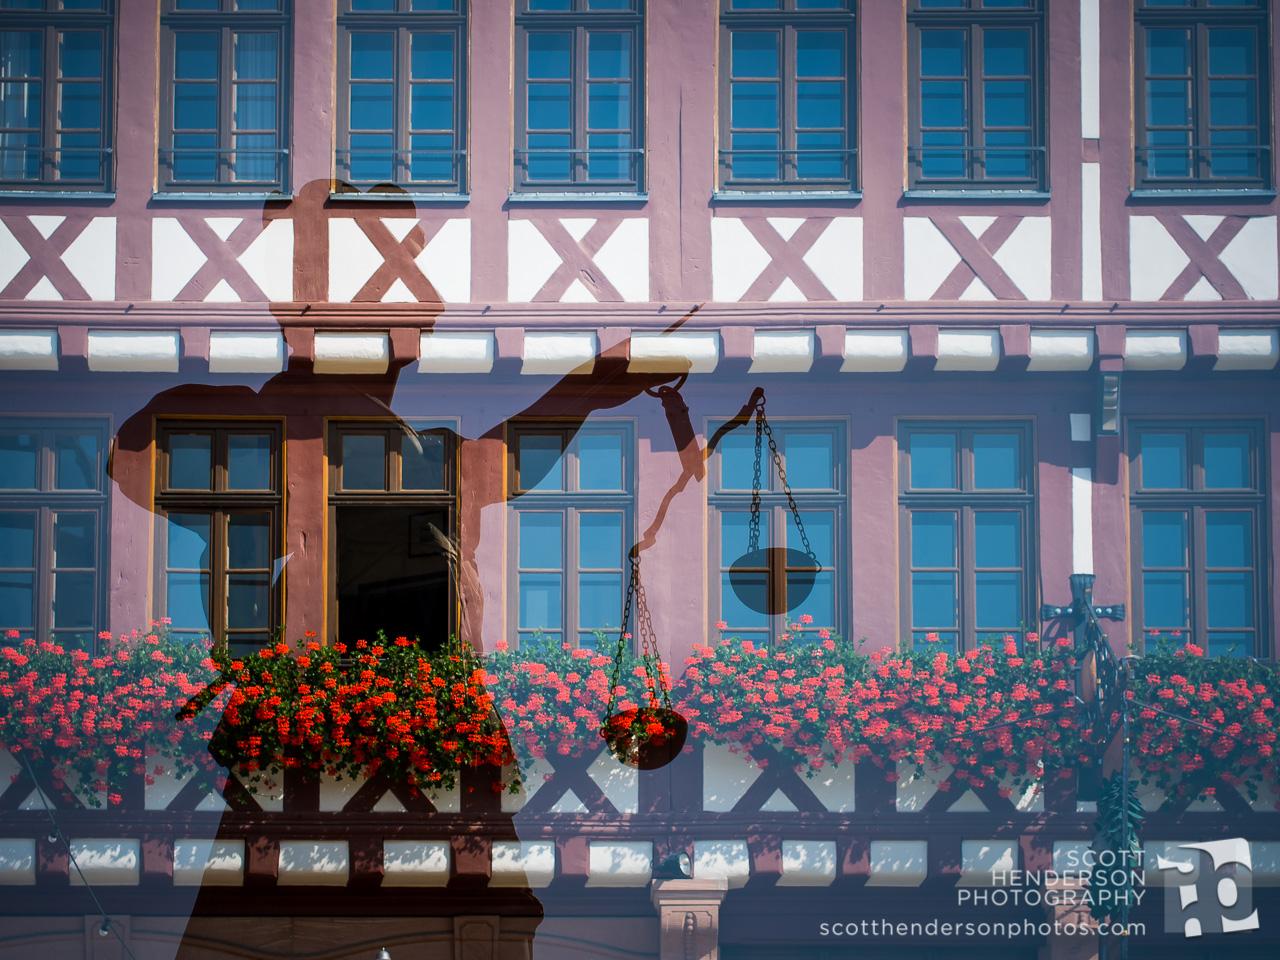 shp-germany-2014-006-blog.jpg